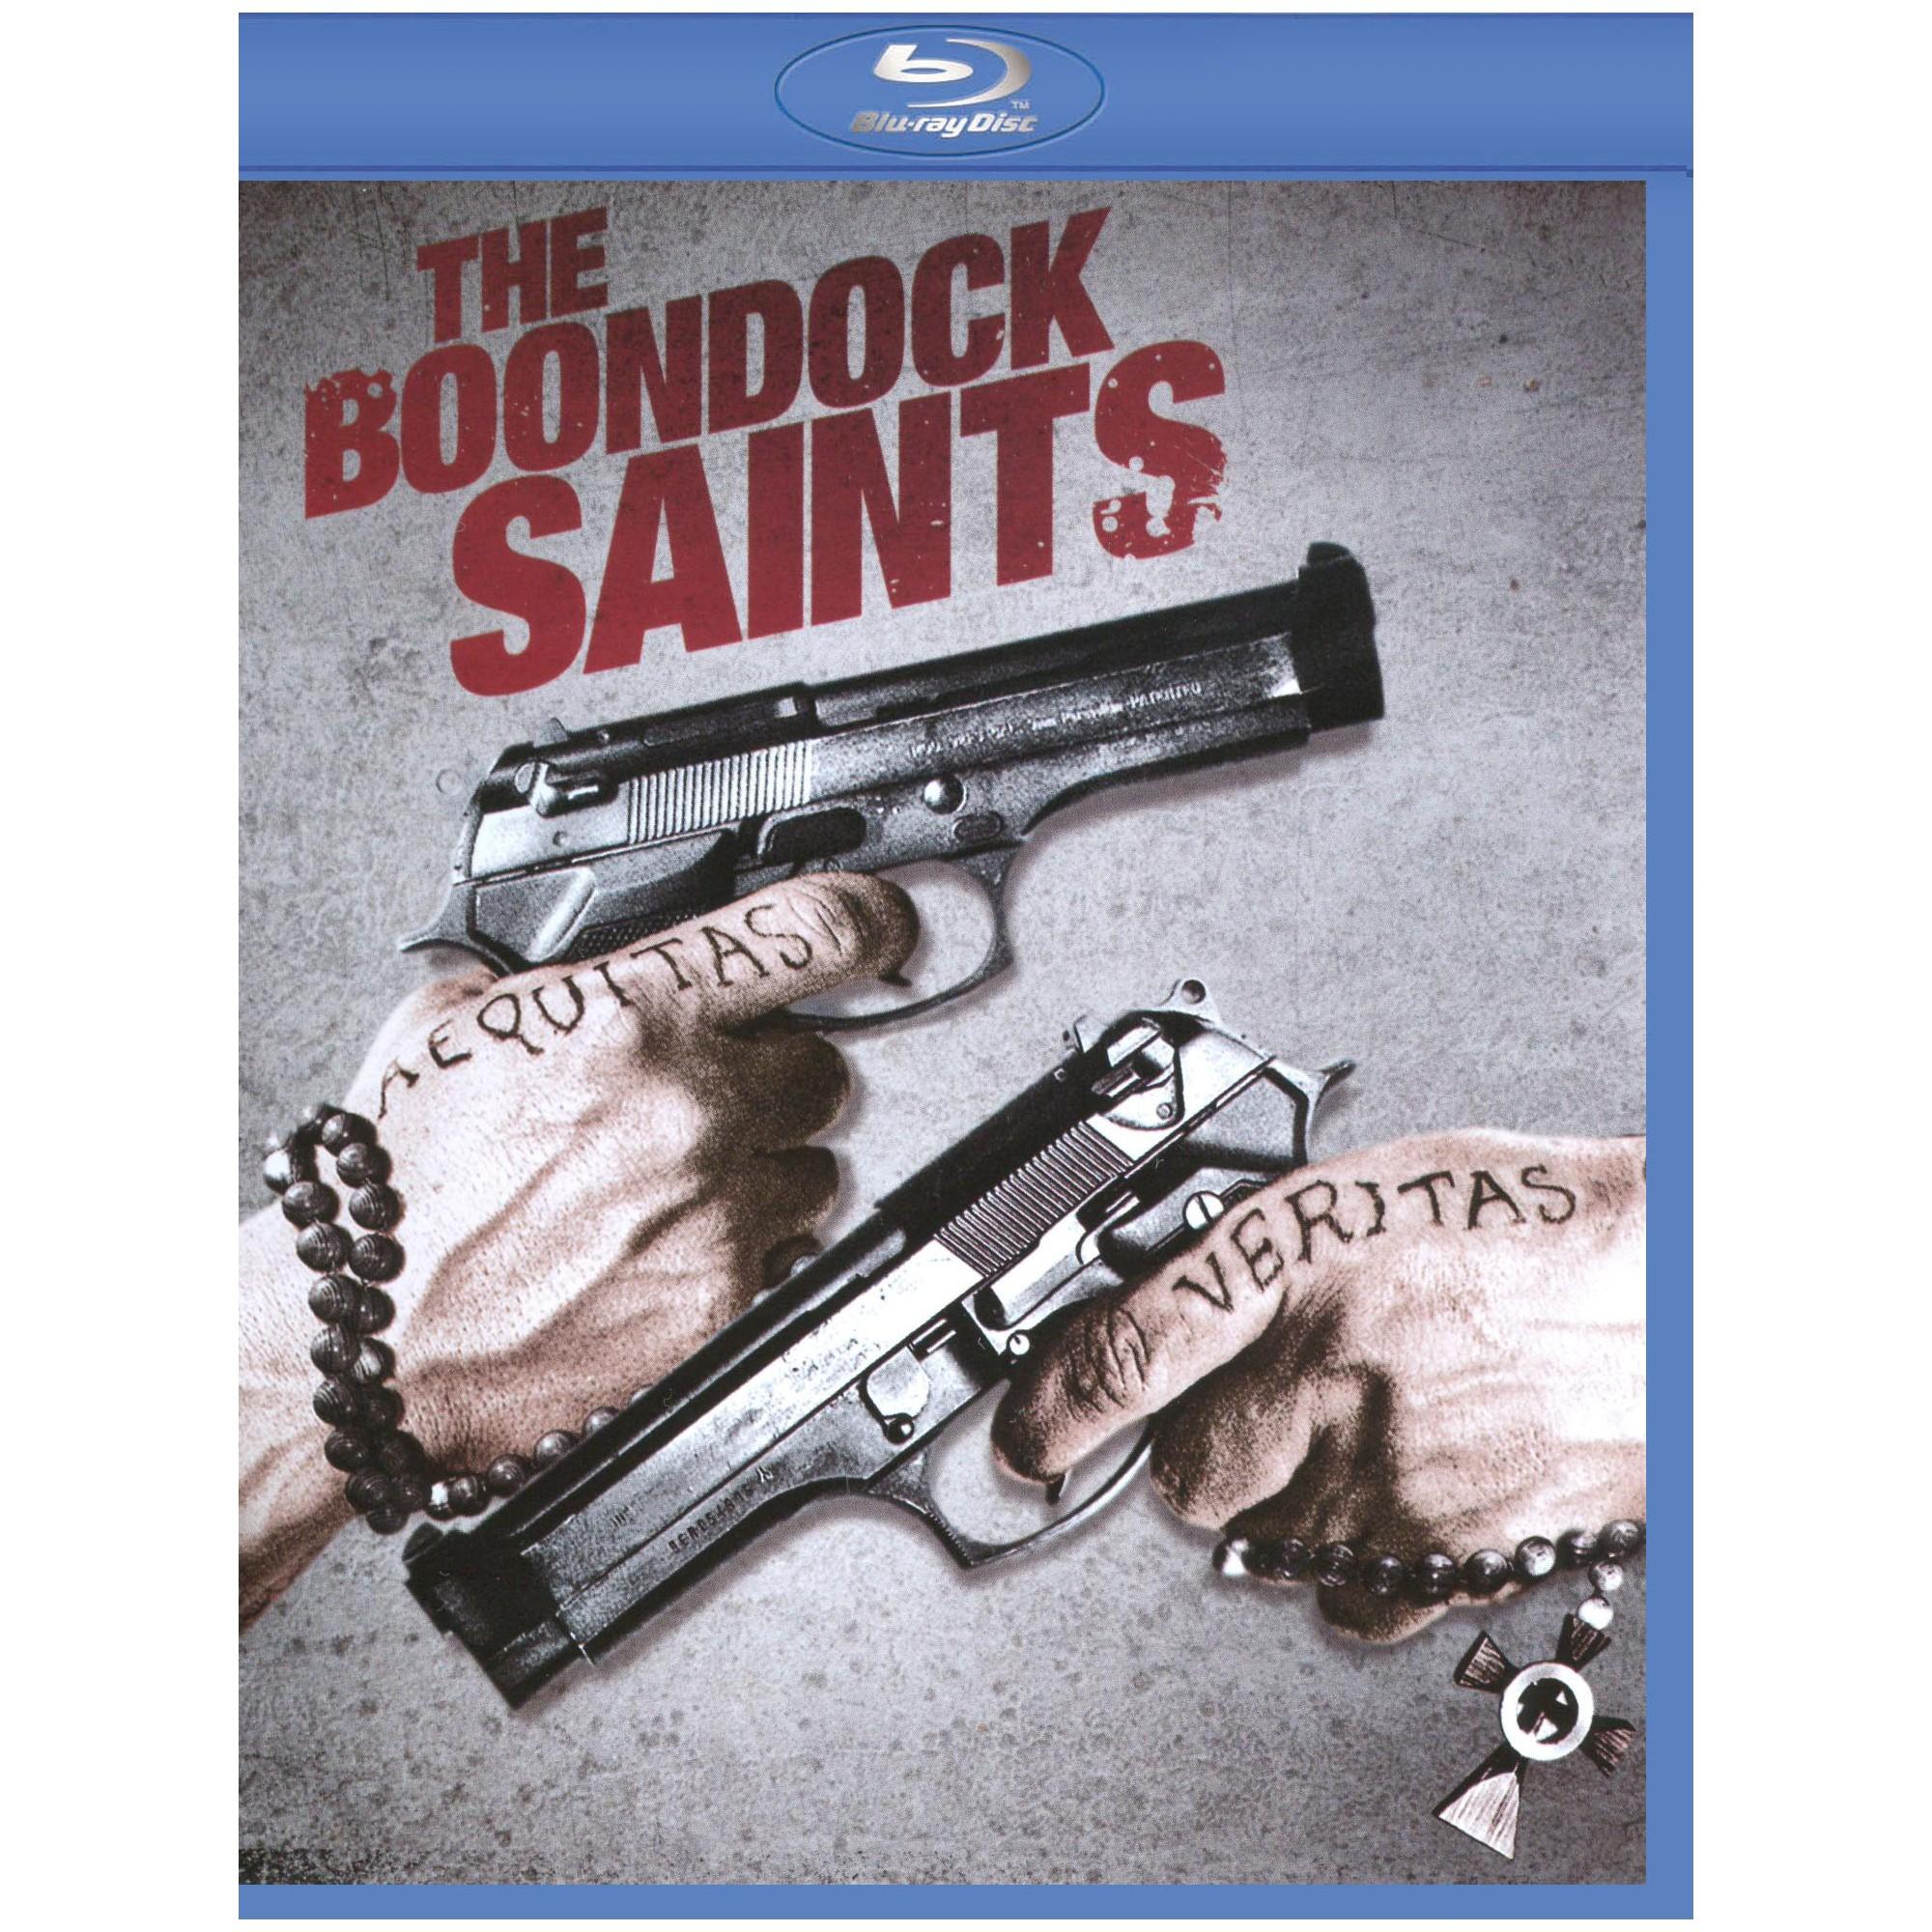 The Boondock Saints Blu Ray Boondock Saints The Boondock Saints Movie Full Movies Online